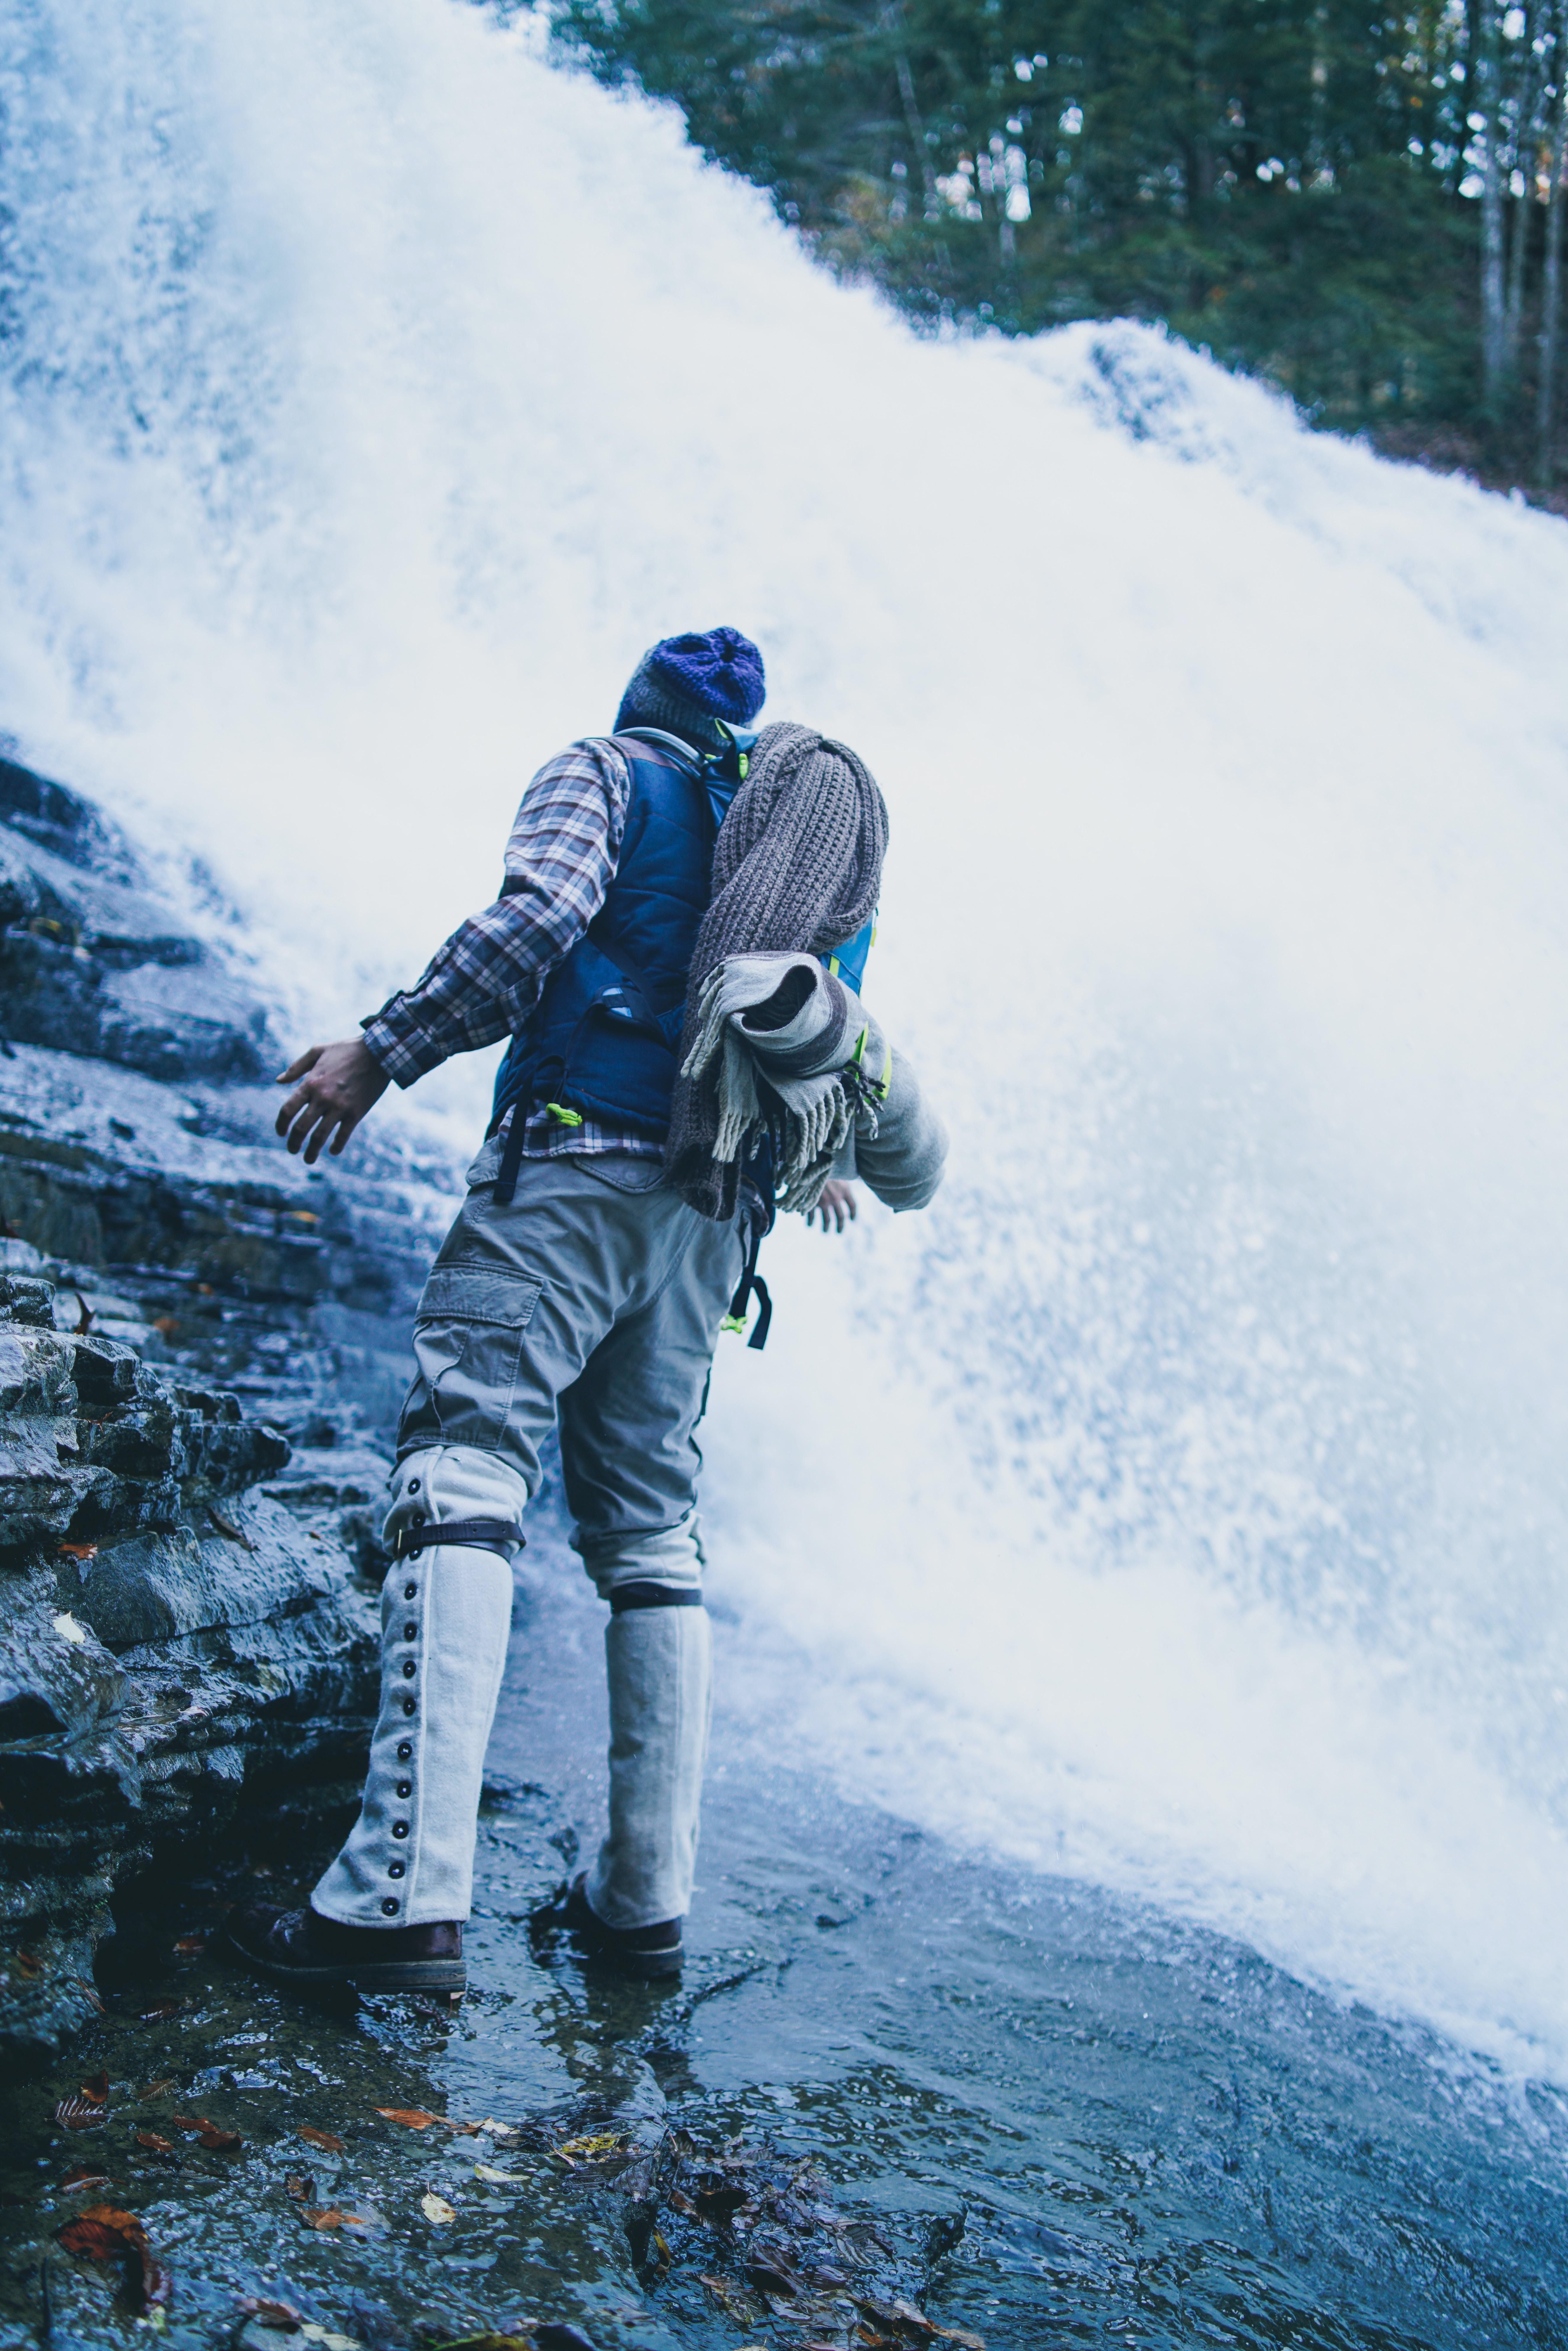 man standing on waterfall